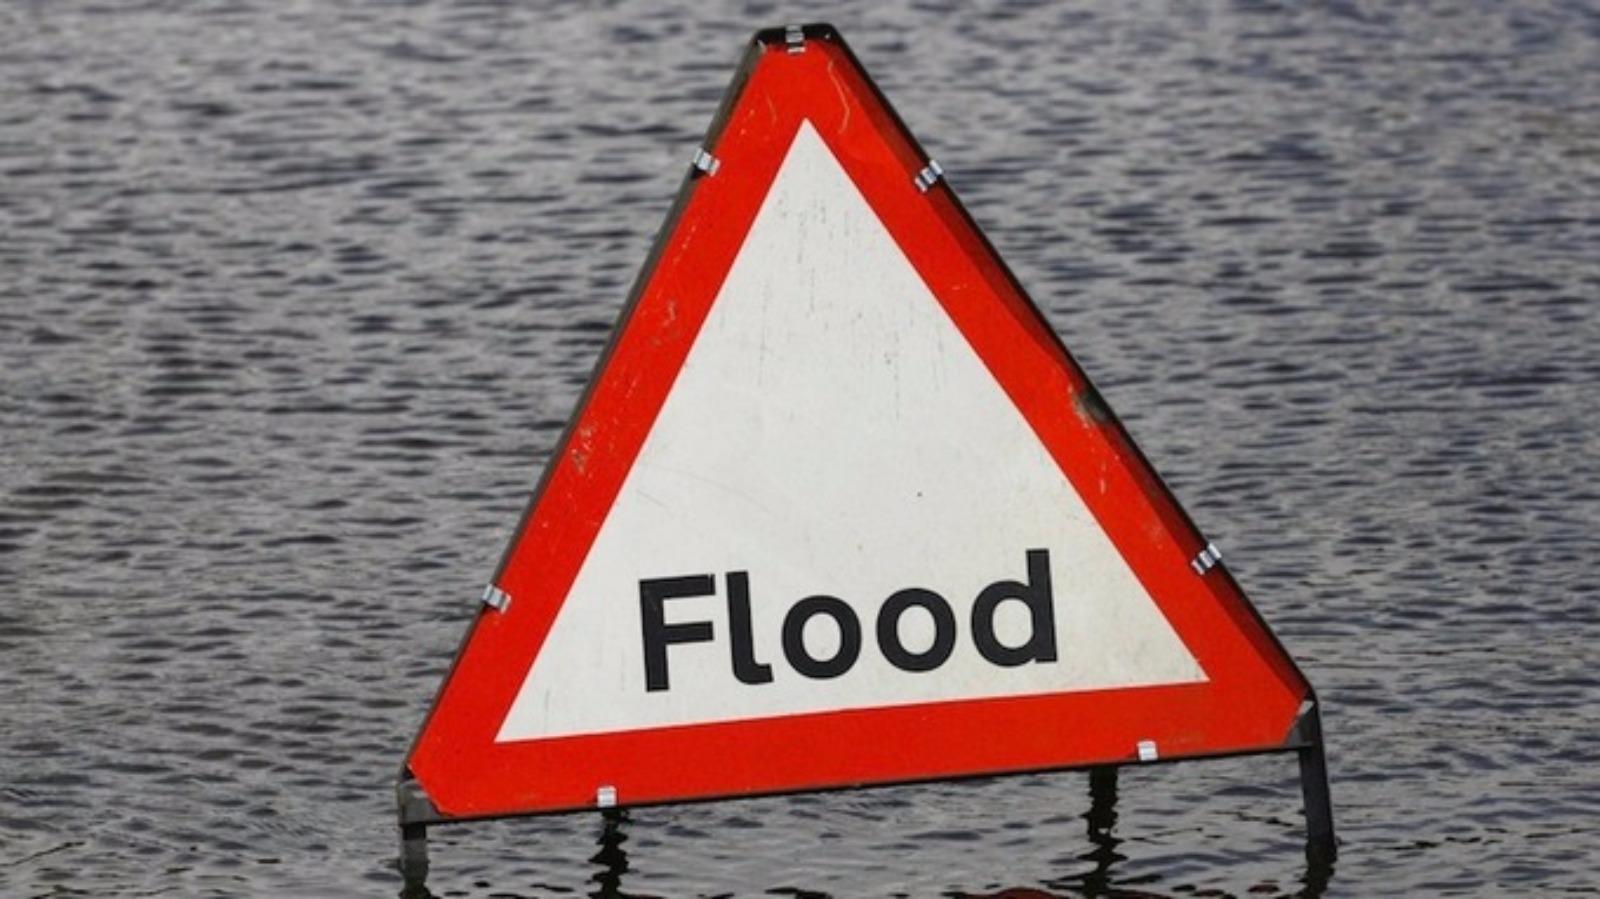 flood warnings - photo #18